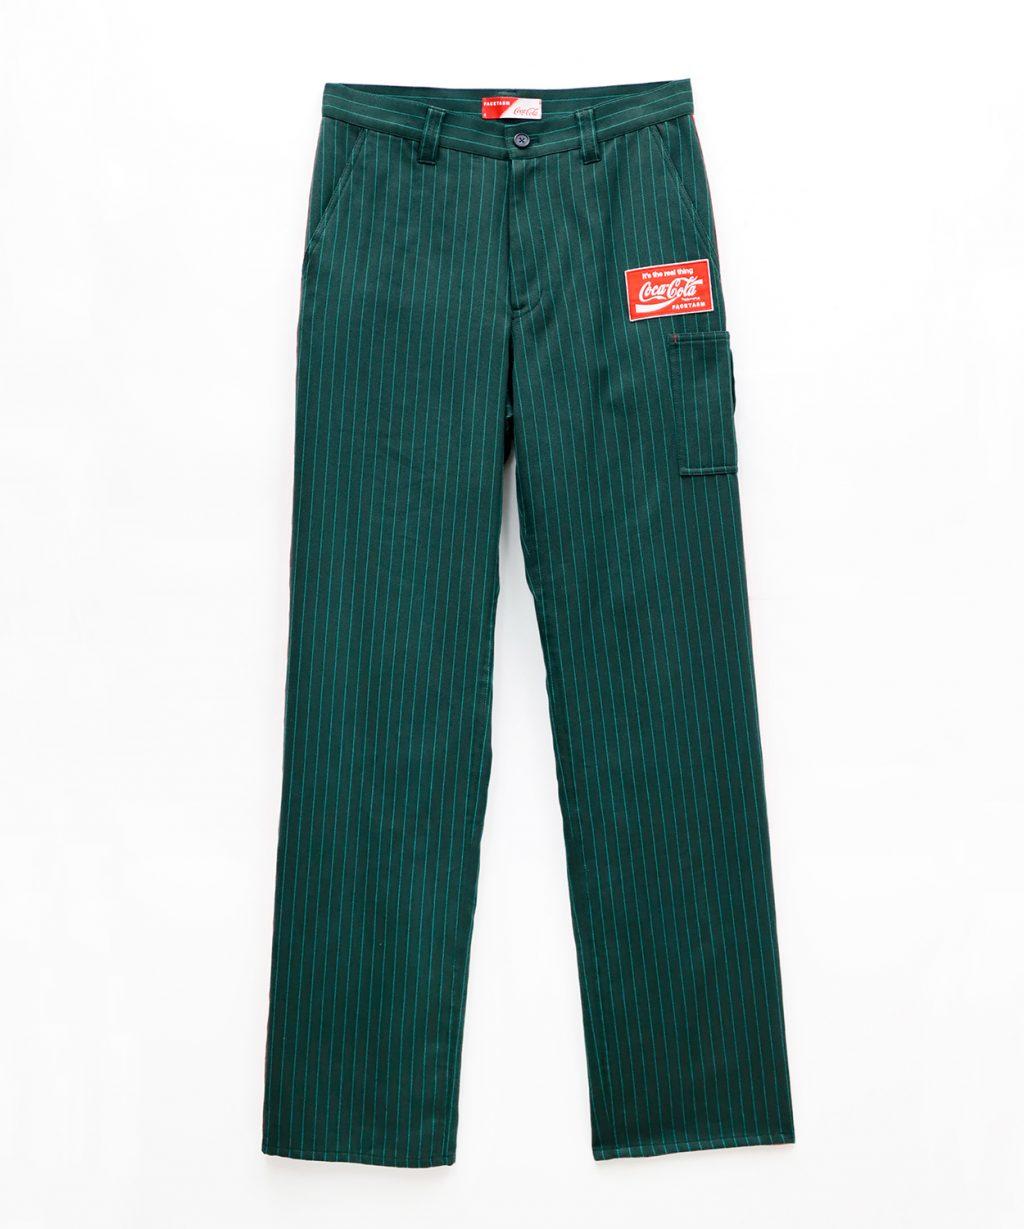 COCA-COLA-STRIPE-PANTS-green1-1024x1229.jpg